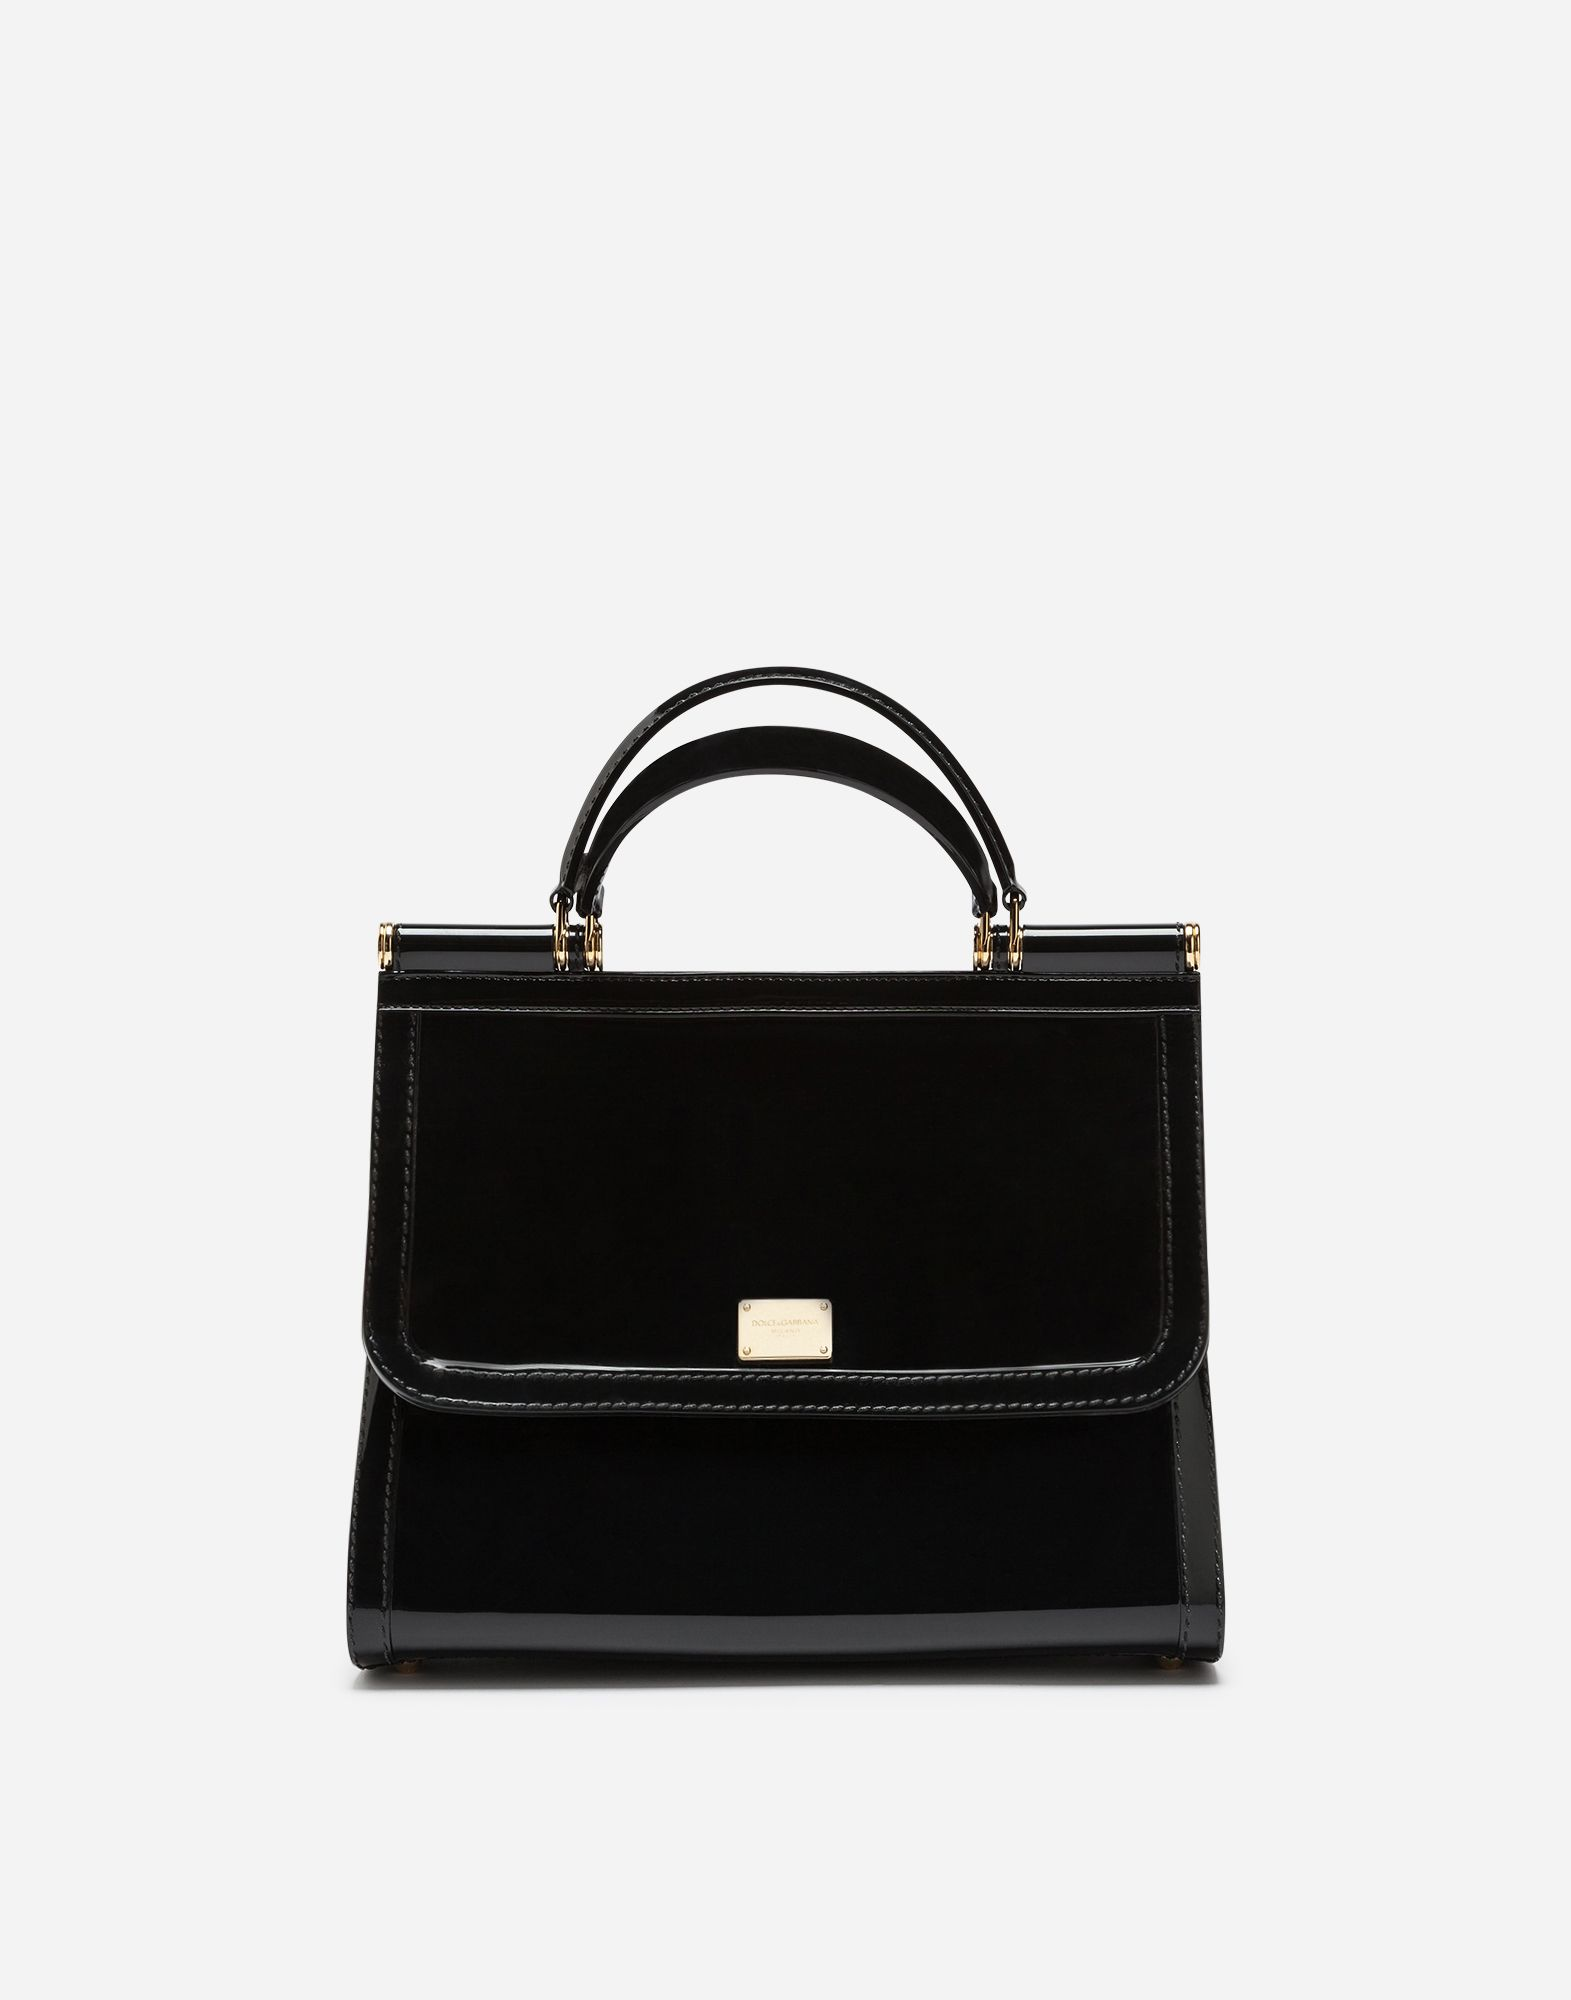 5252216f088e Dolce   Gabbana - Semi-transparent rubber black Sicily handbag ( 995)